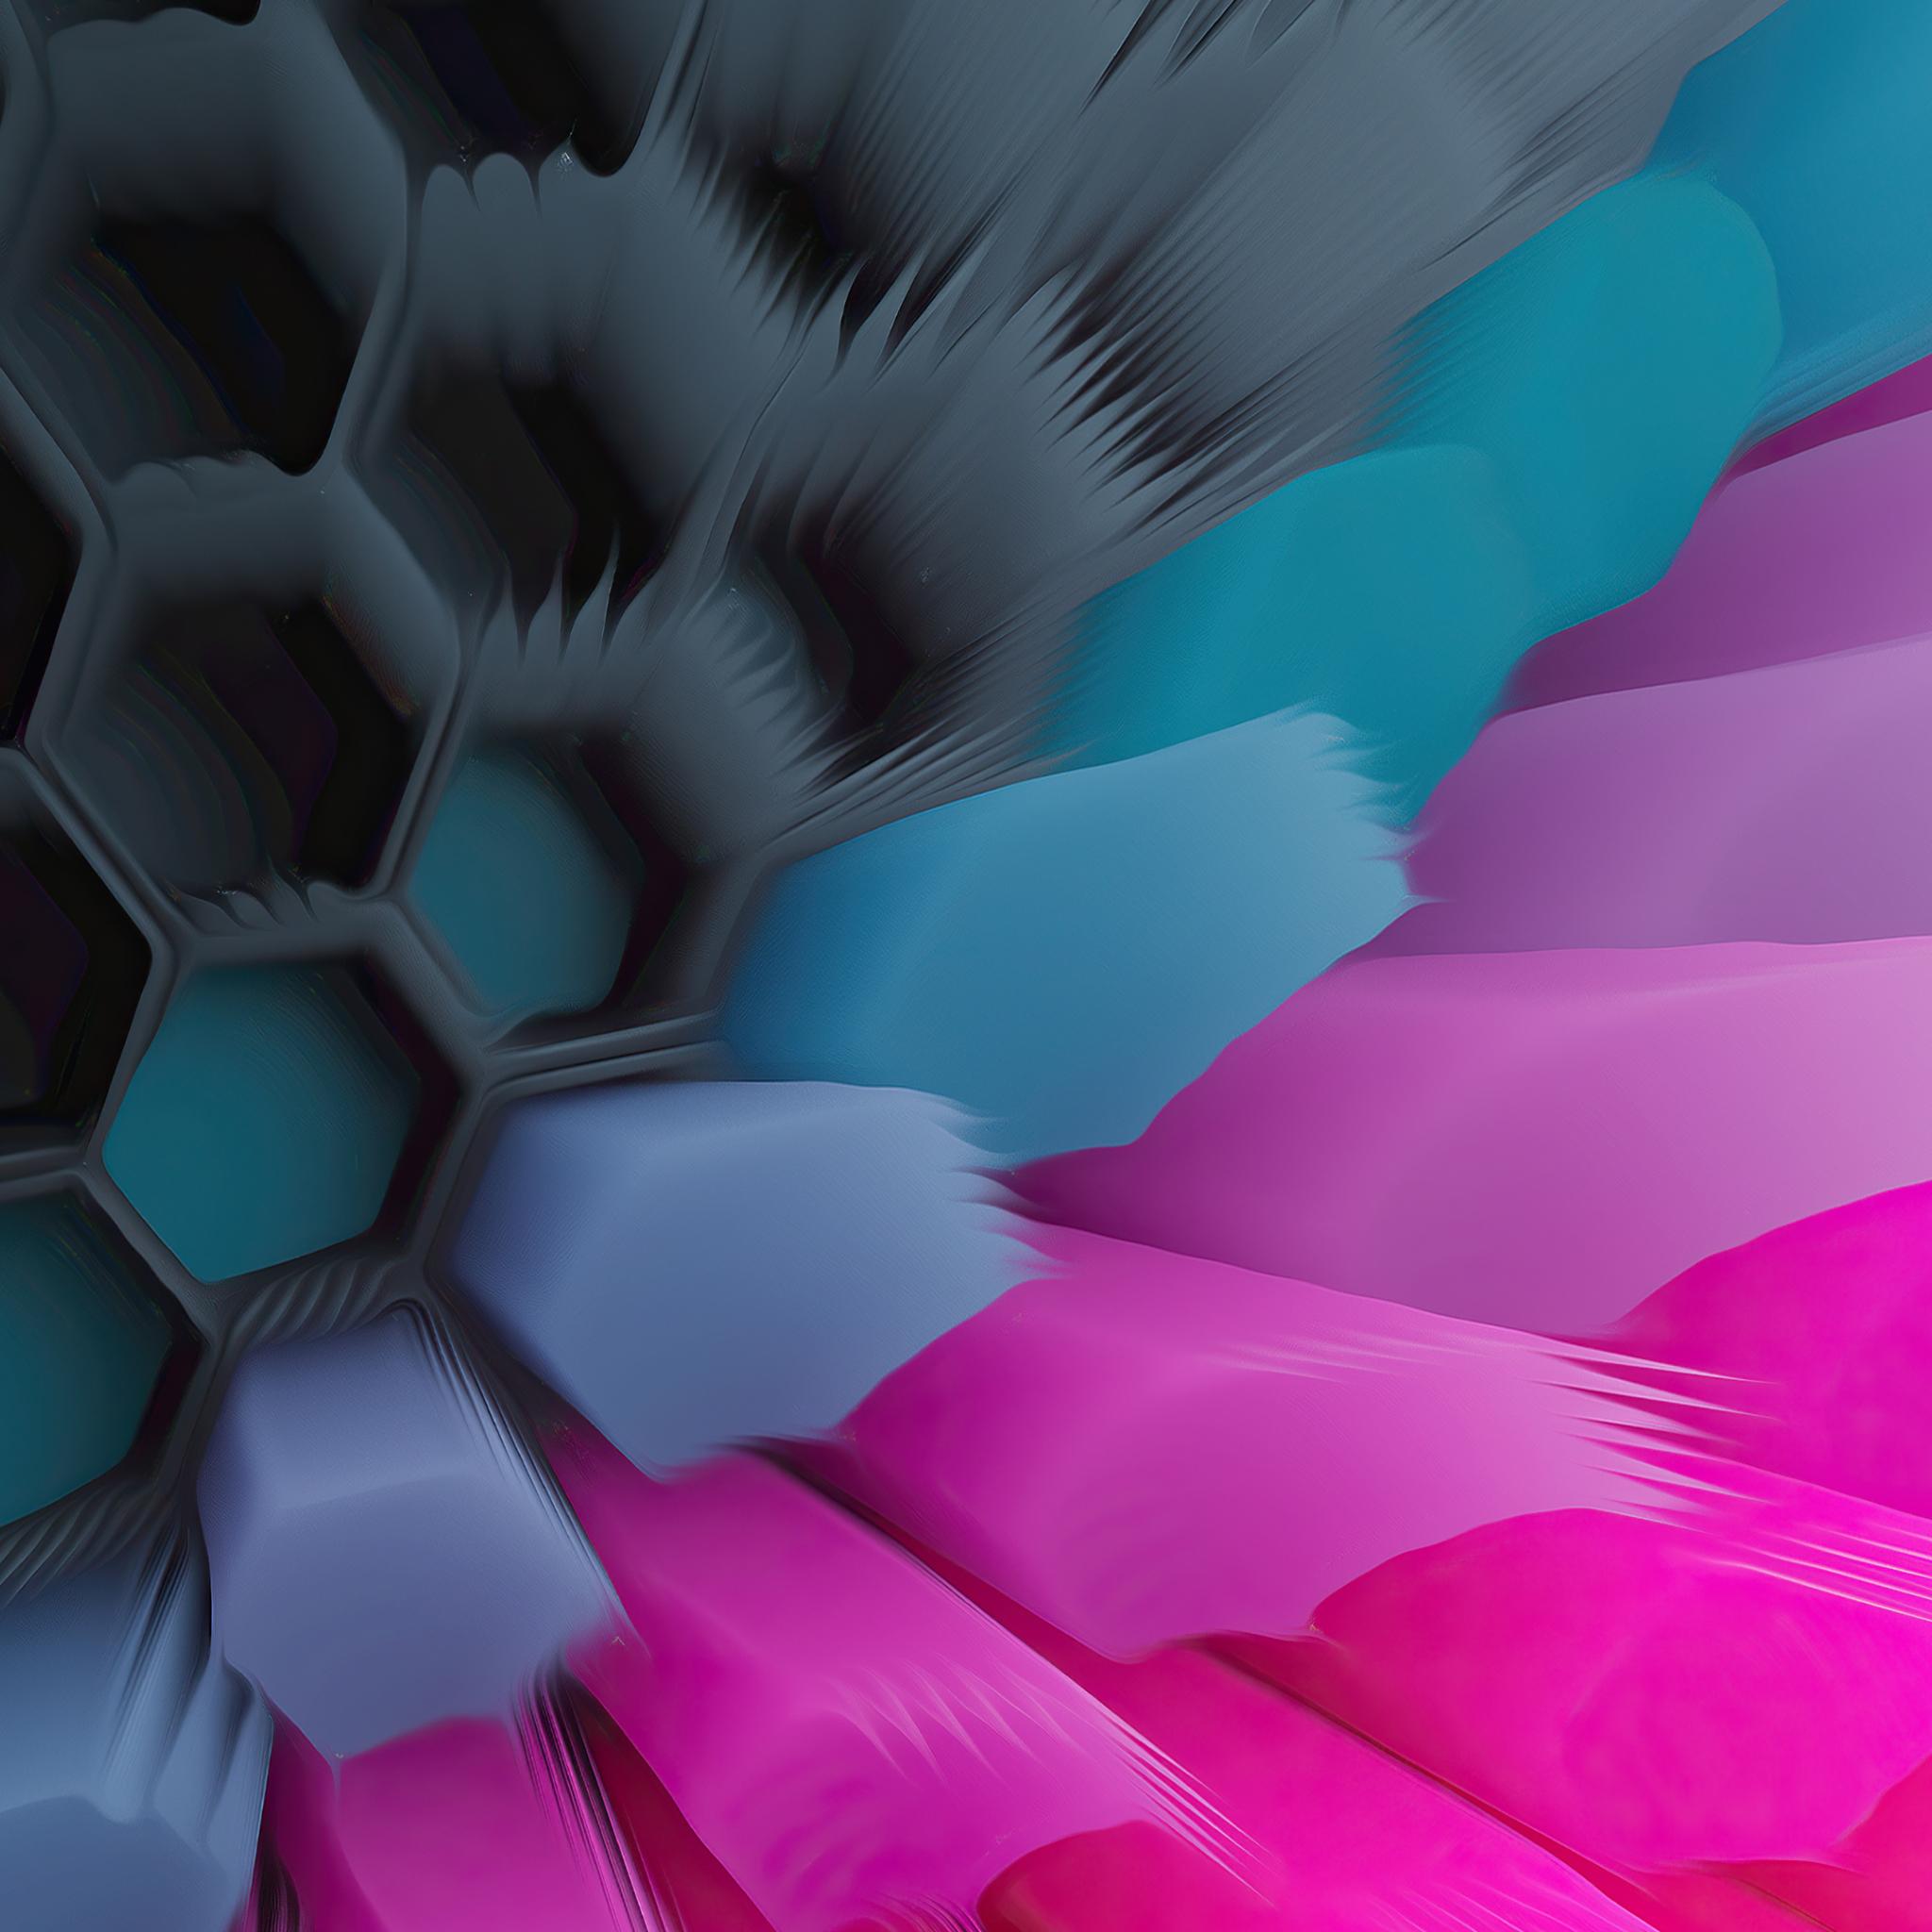 Pink Blue 4K Hexagon Wallpaper in 2048x2048 Resolution